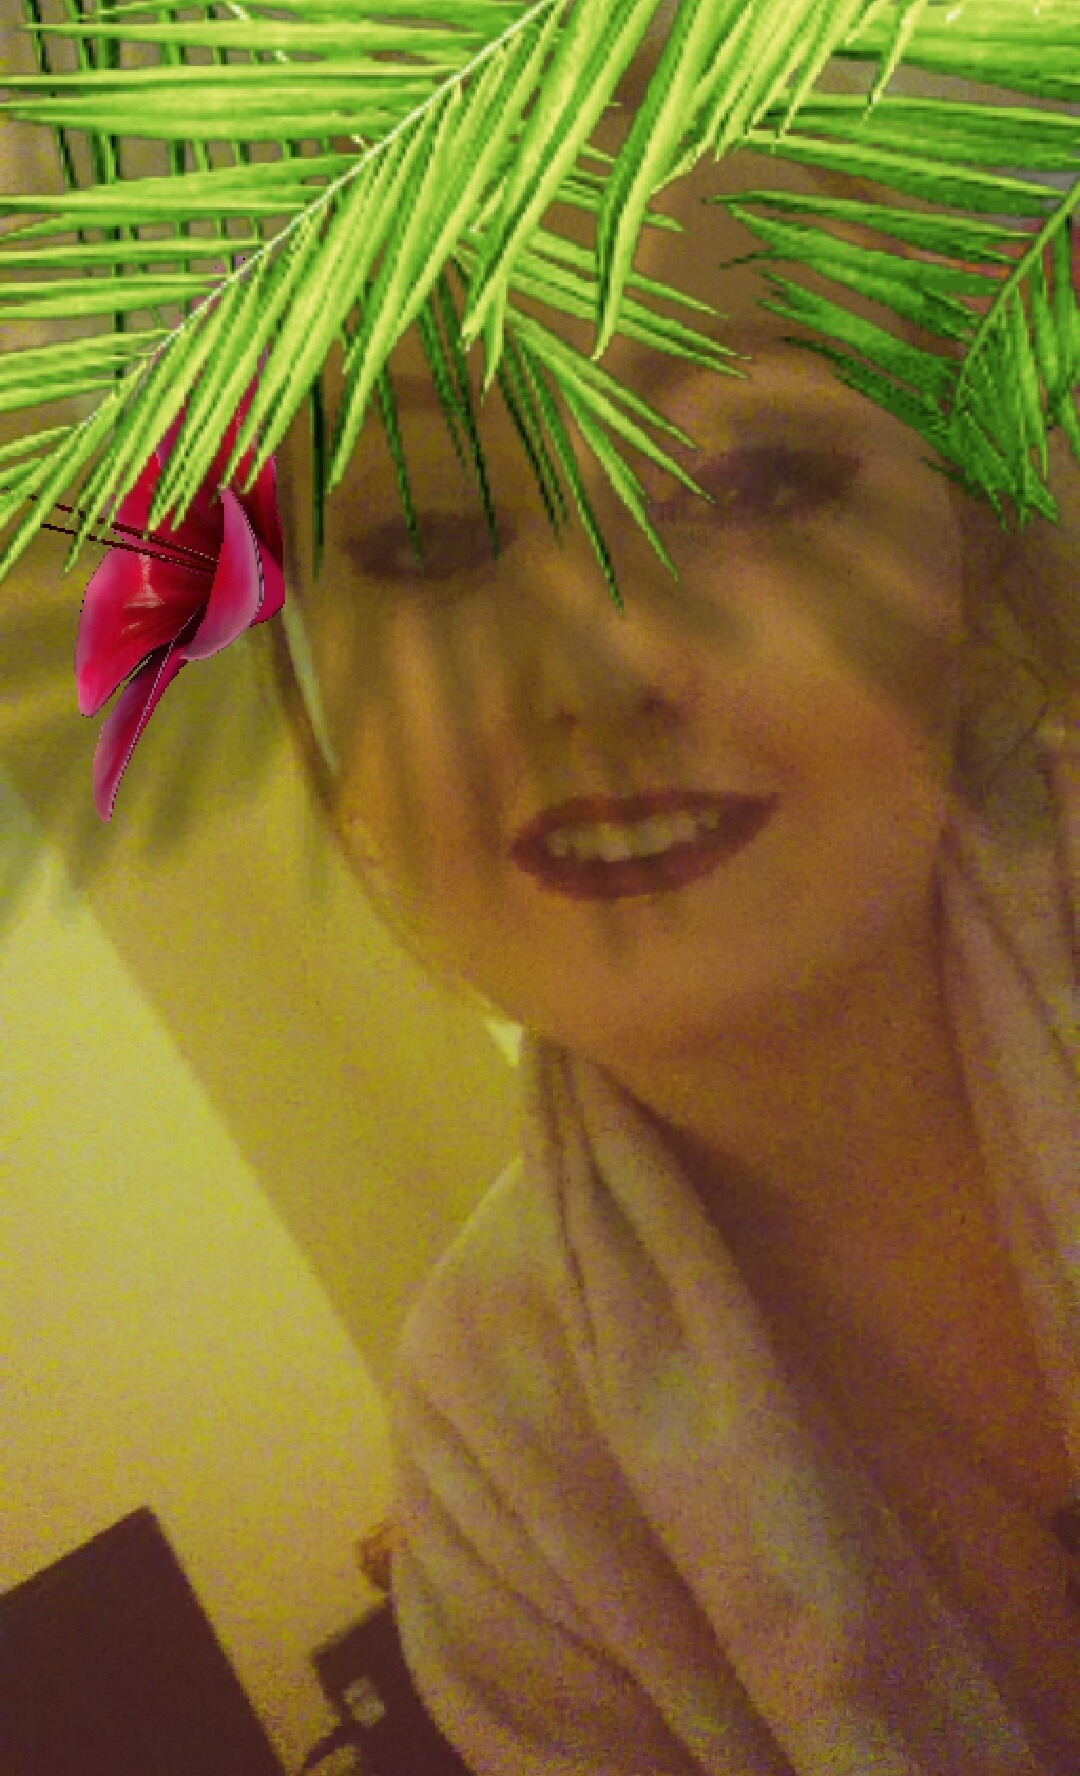 snapchat filter selfie